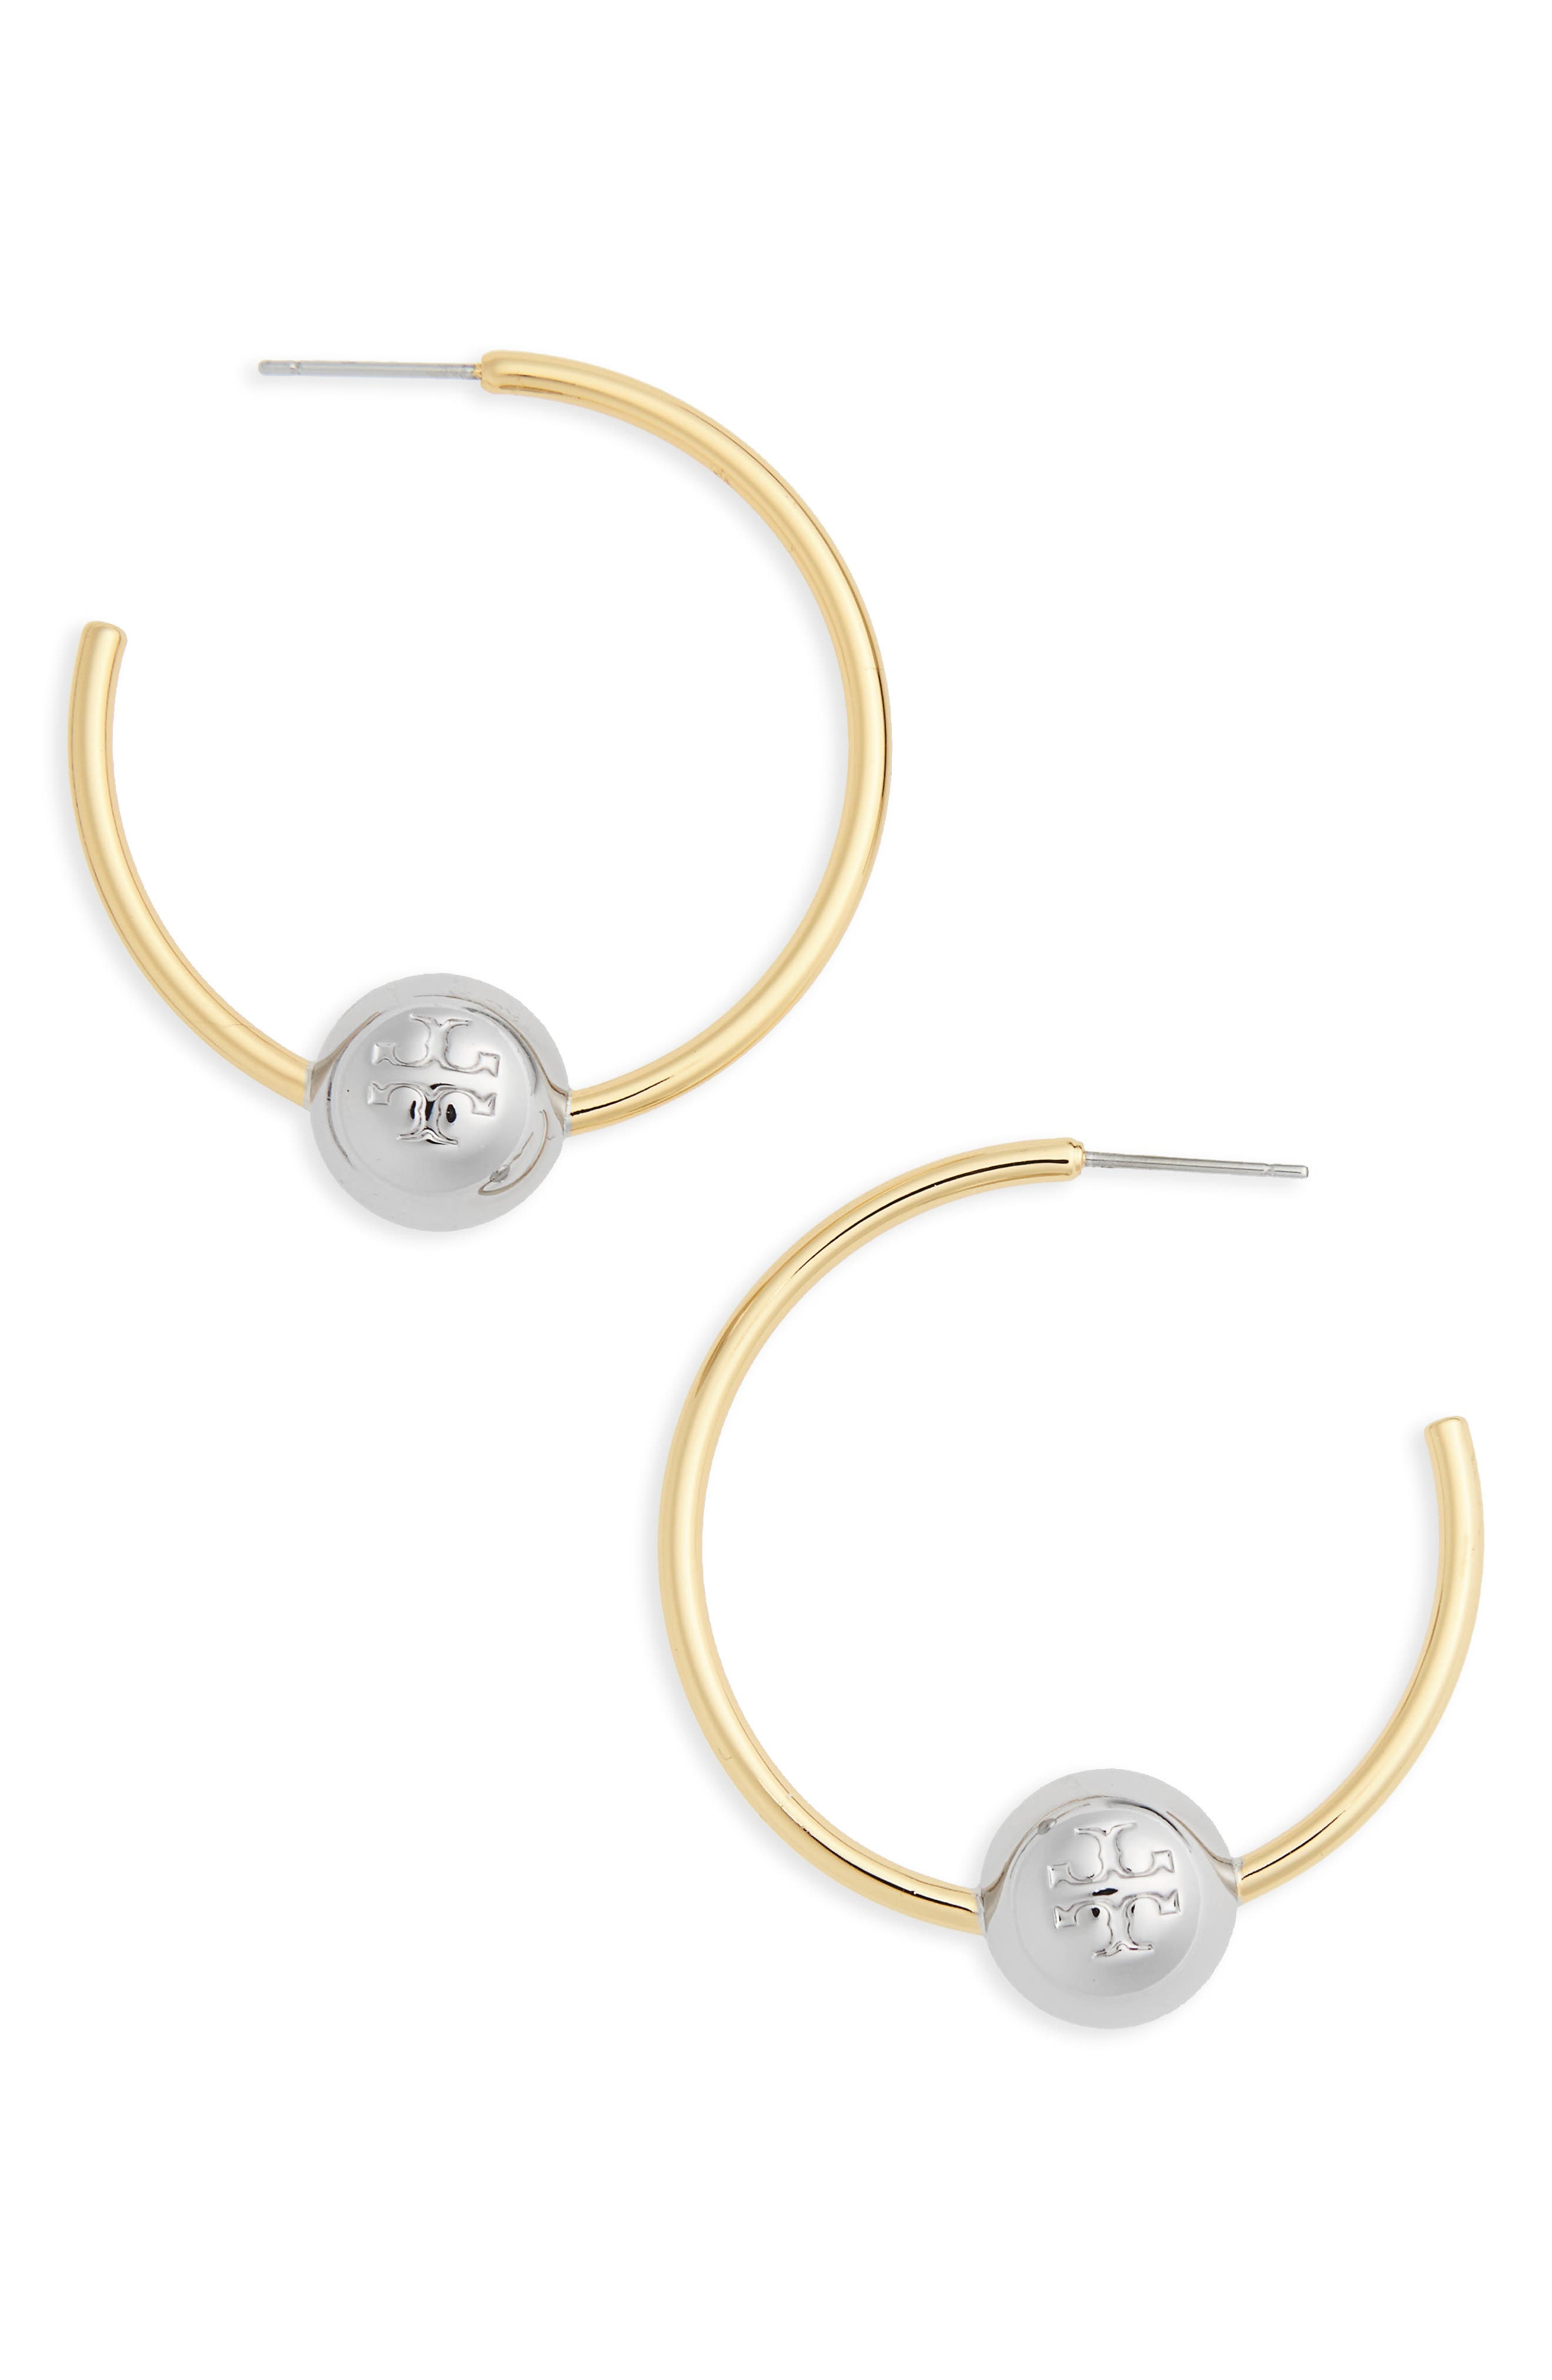 Main Image - Tory Burch Logo Hoop Earrings